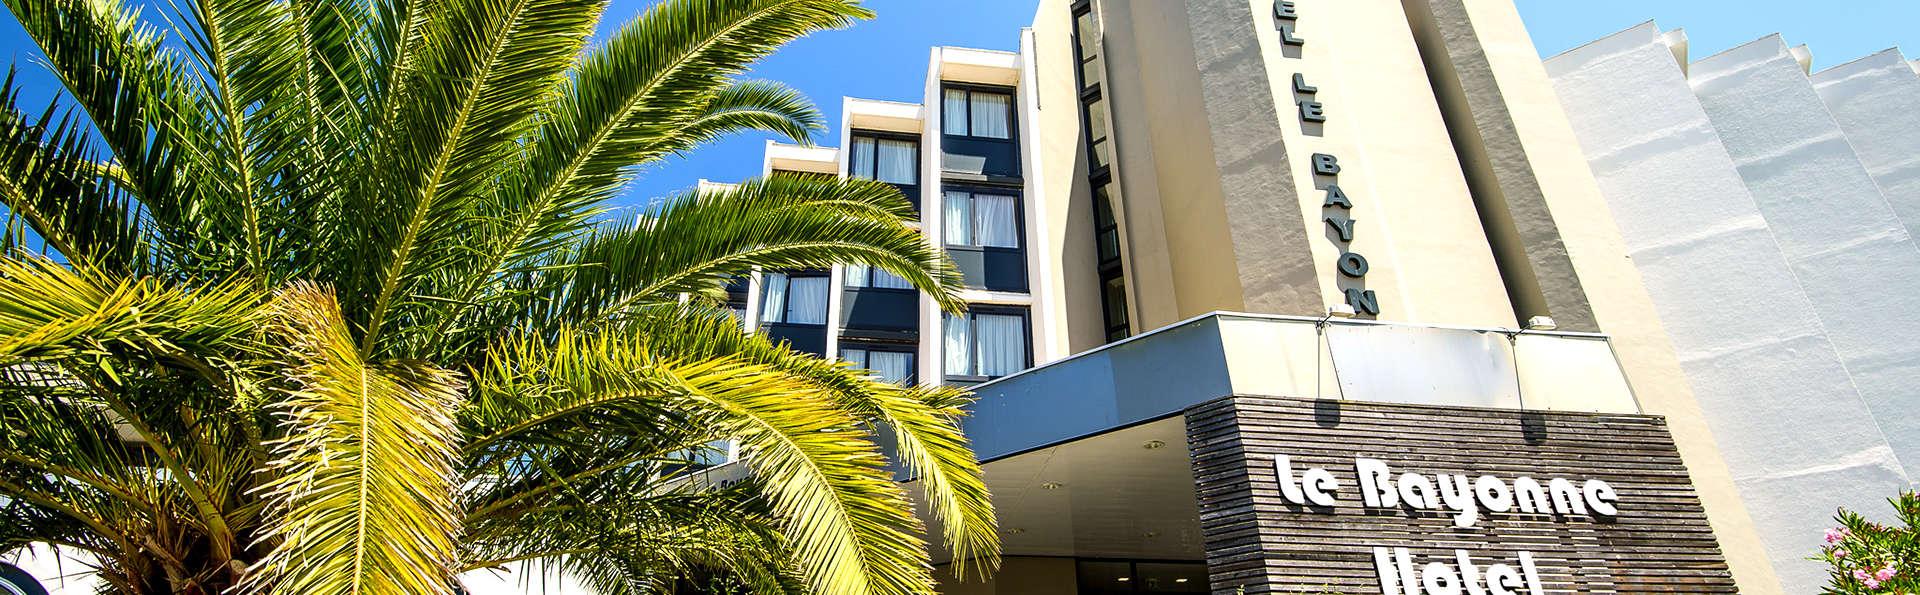 Hôtel le Bayonne - EDIT_NEW_FRONT2.jpg